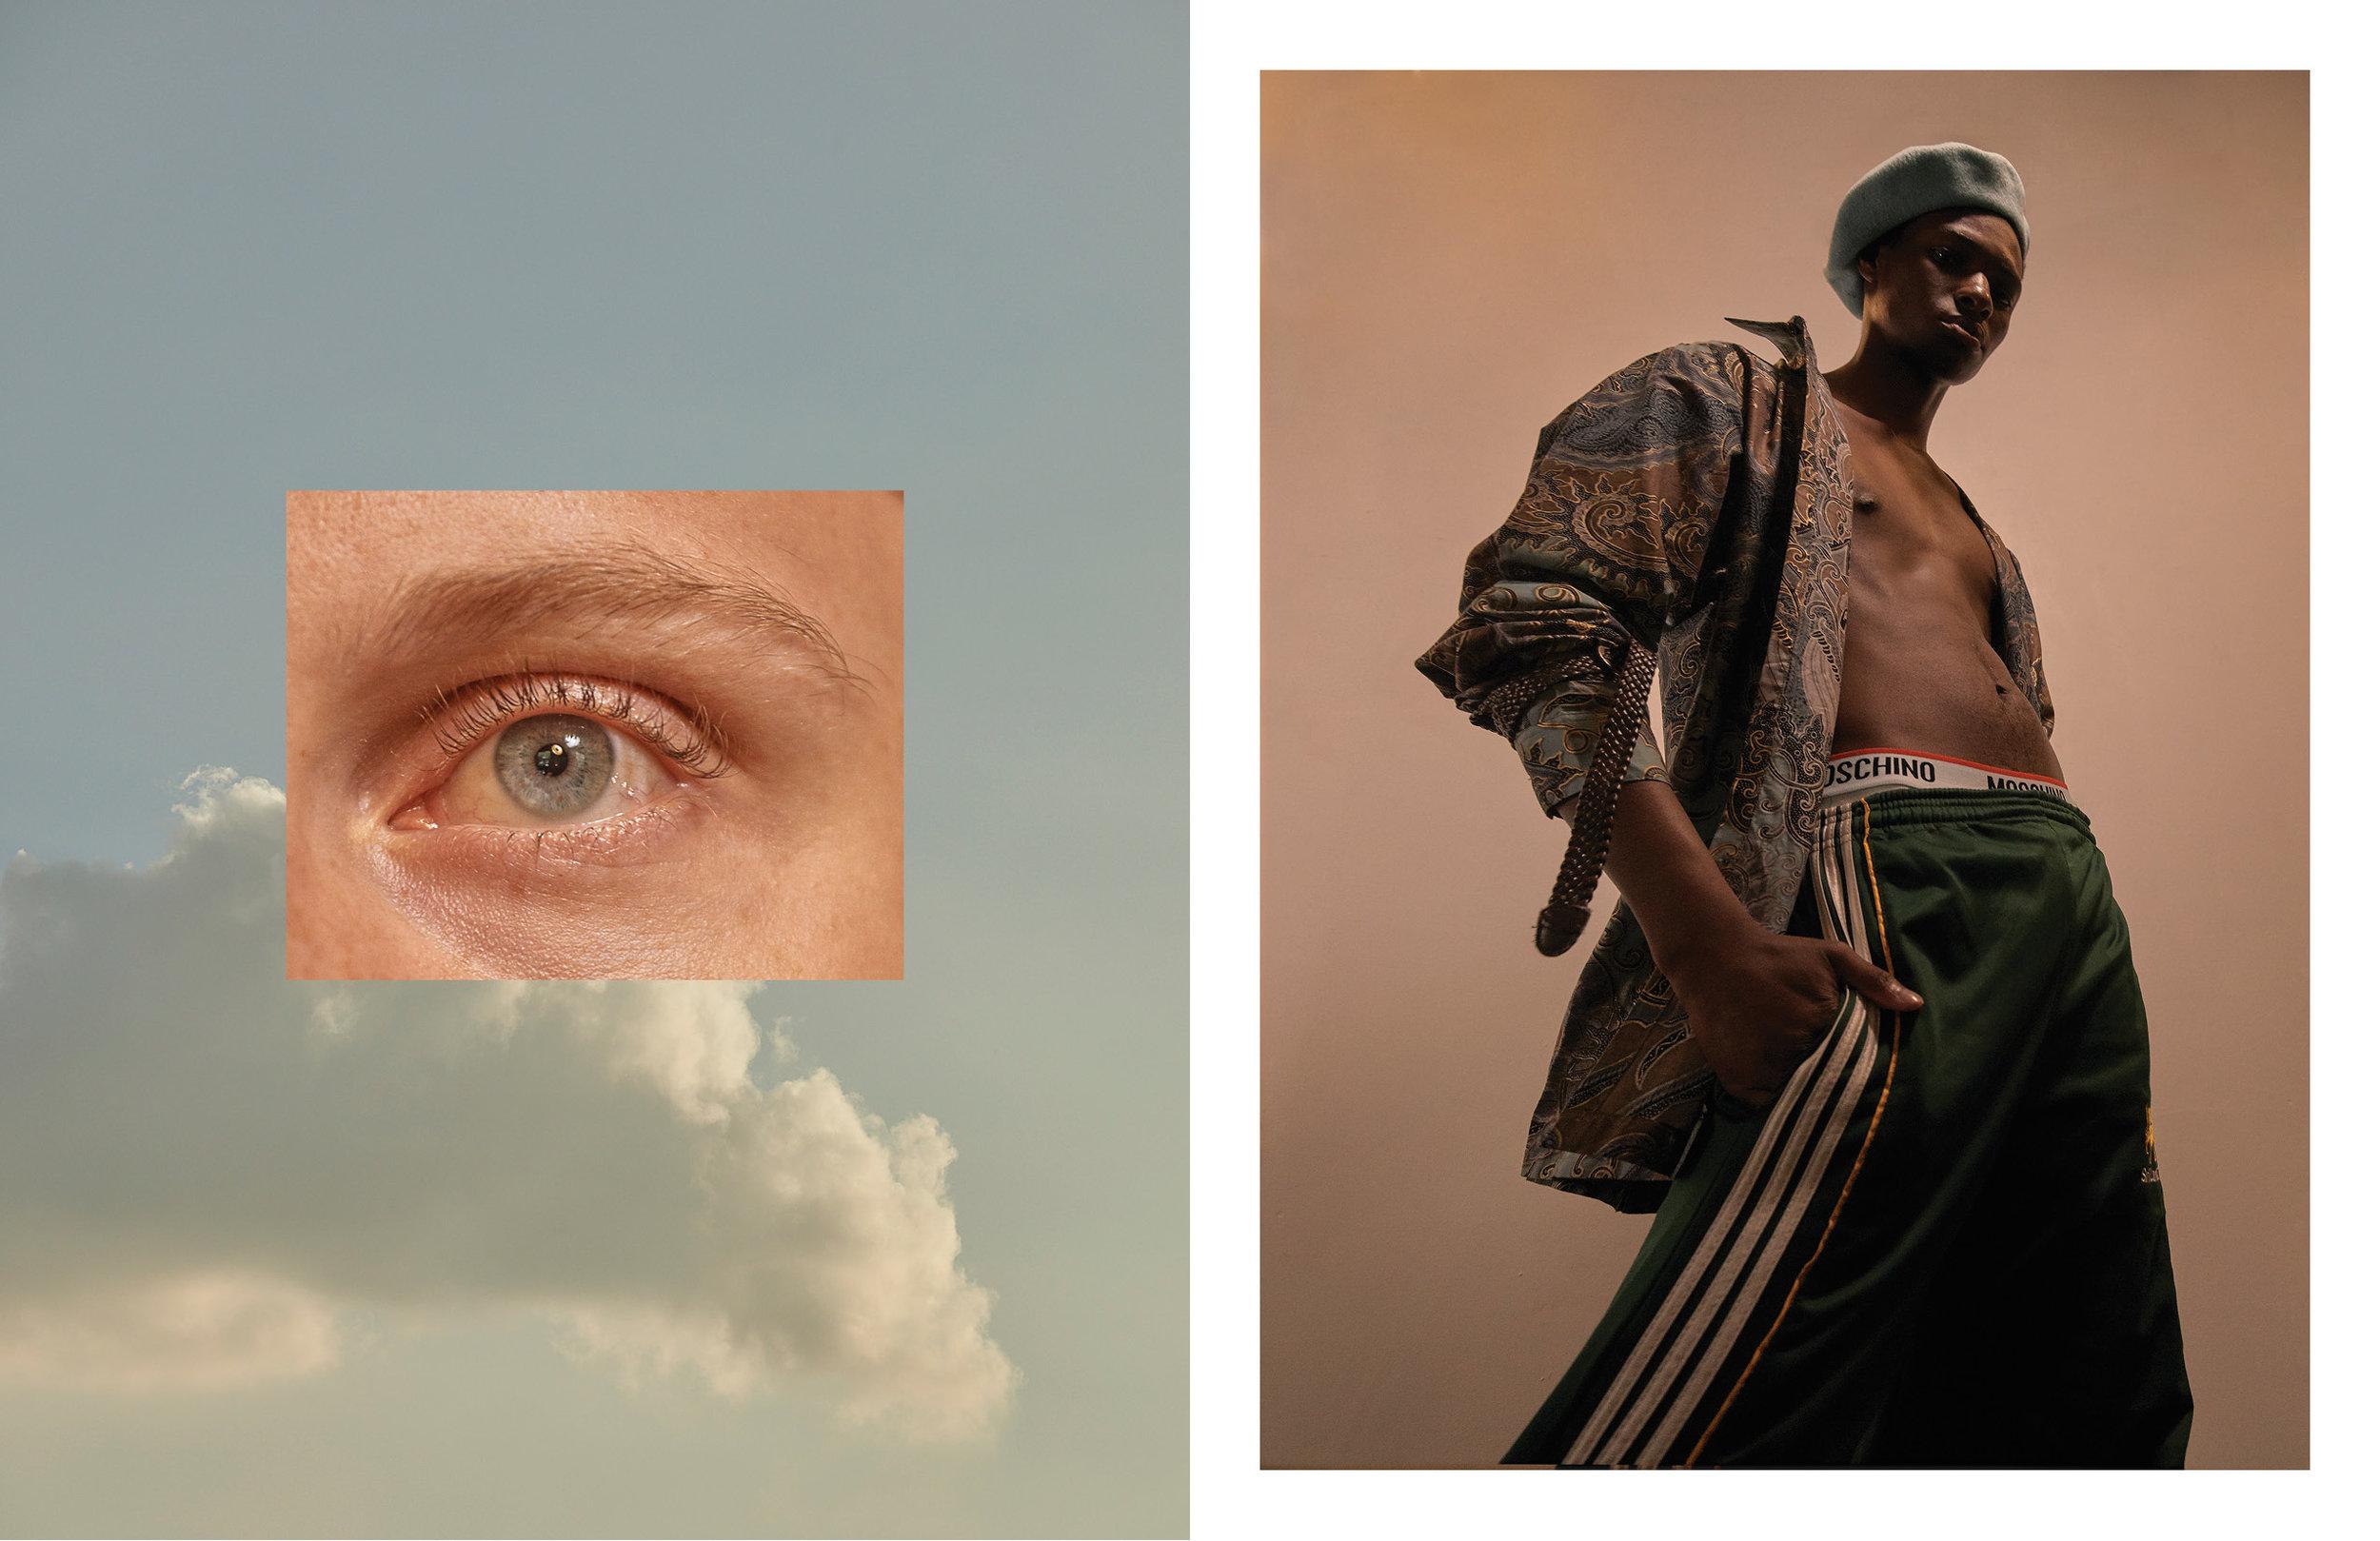 IndividualVSUniversal-Art of Looking4.jpg